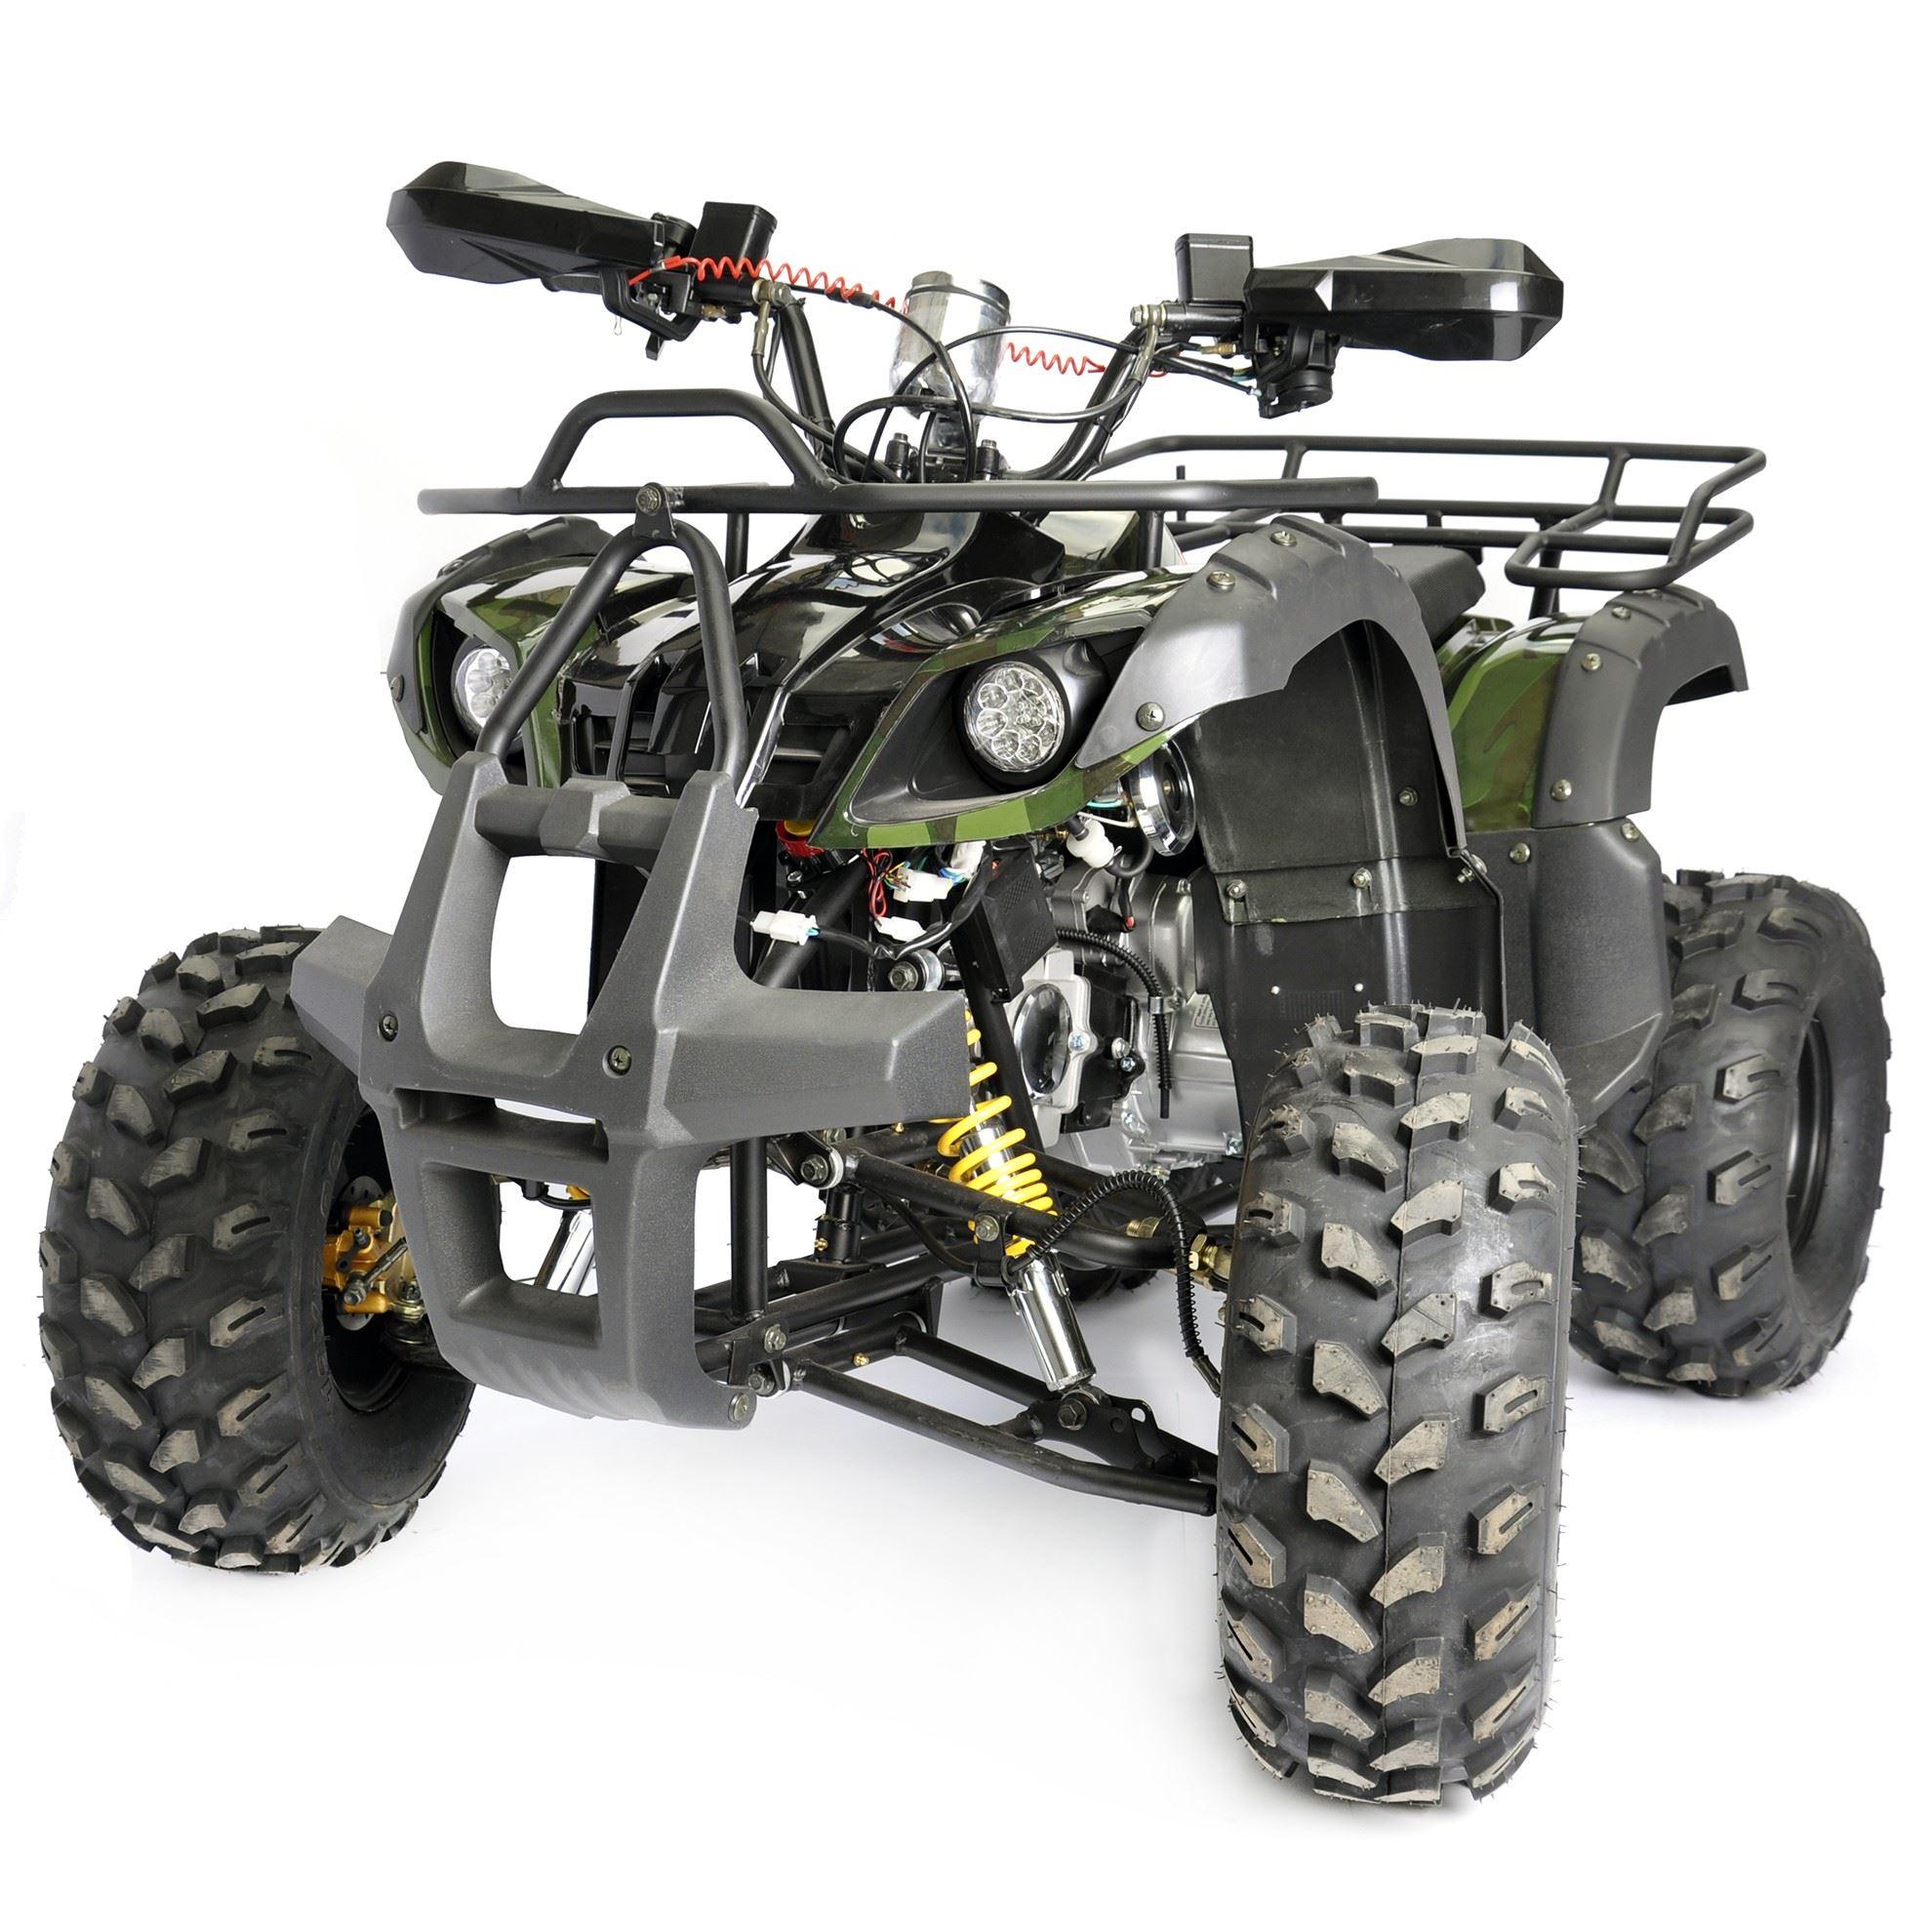 d658415066047 Štvorkolka ATV Toronto 125ccm (3+1) Deluxe RS, camo | ATV ...